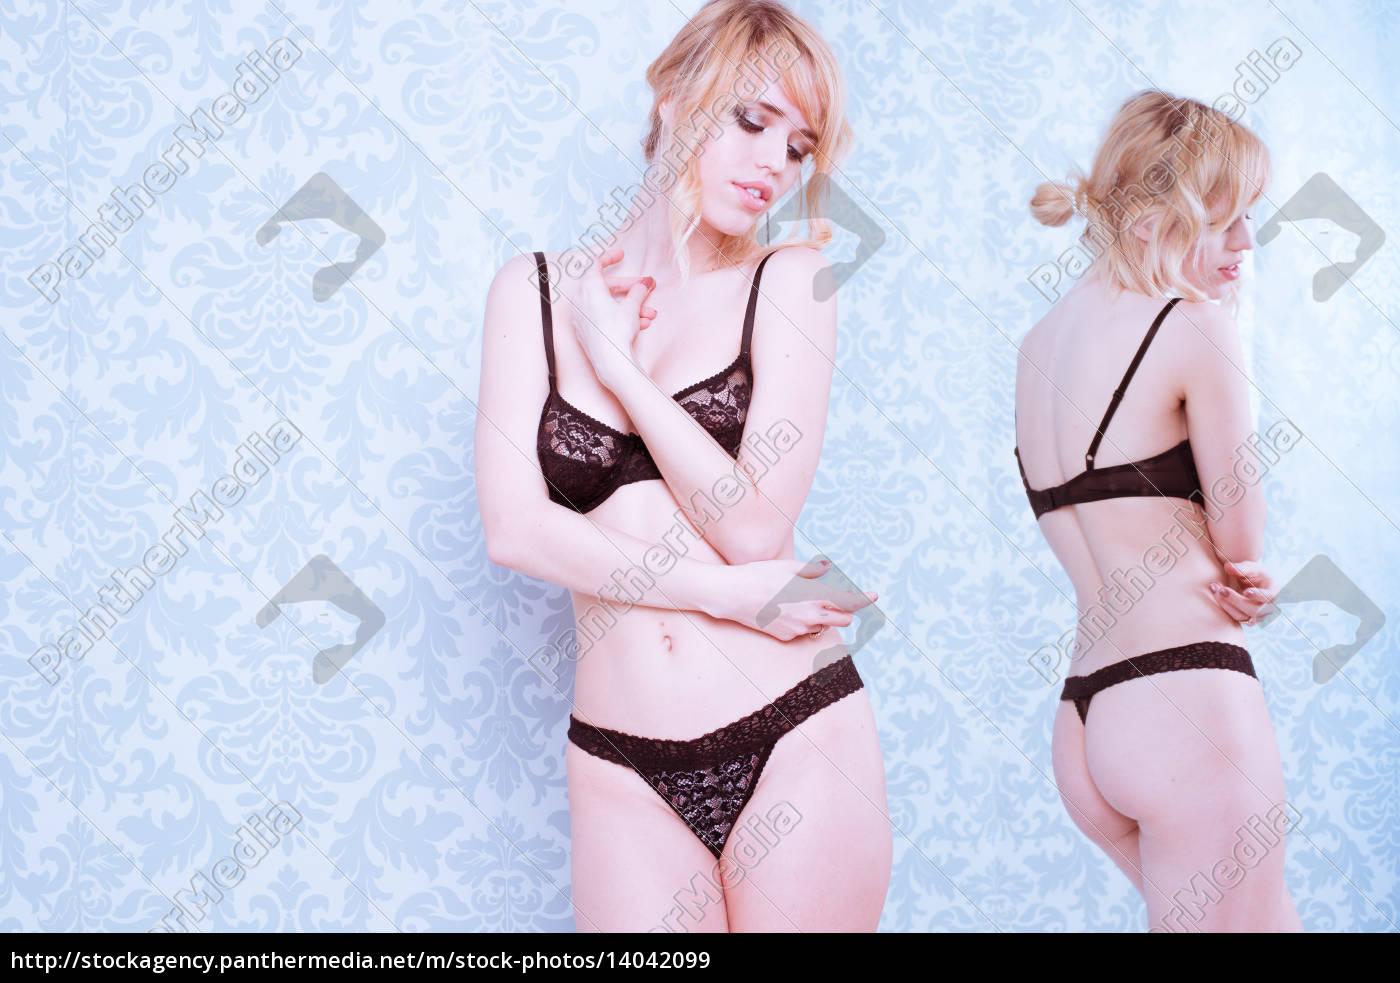 woman, wearing, bra, and, panties, standing - 14042099